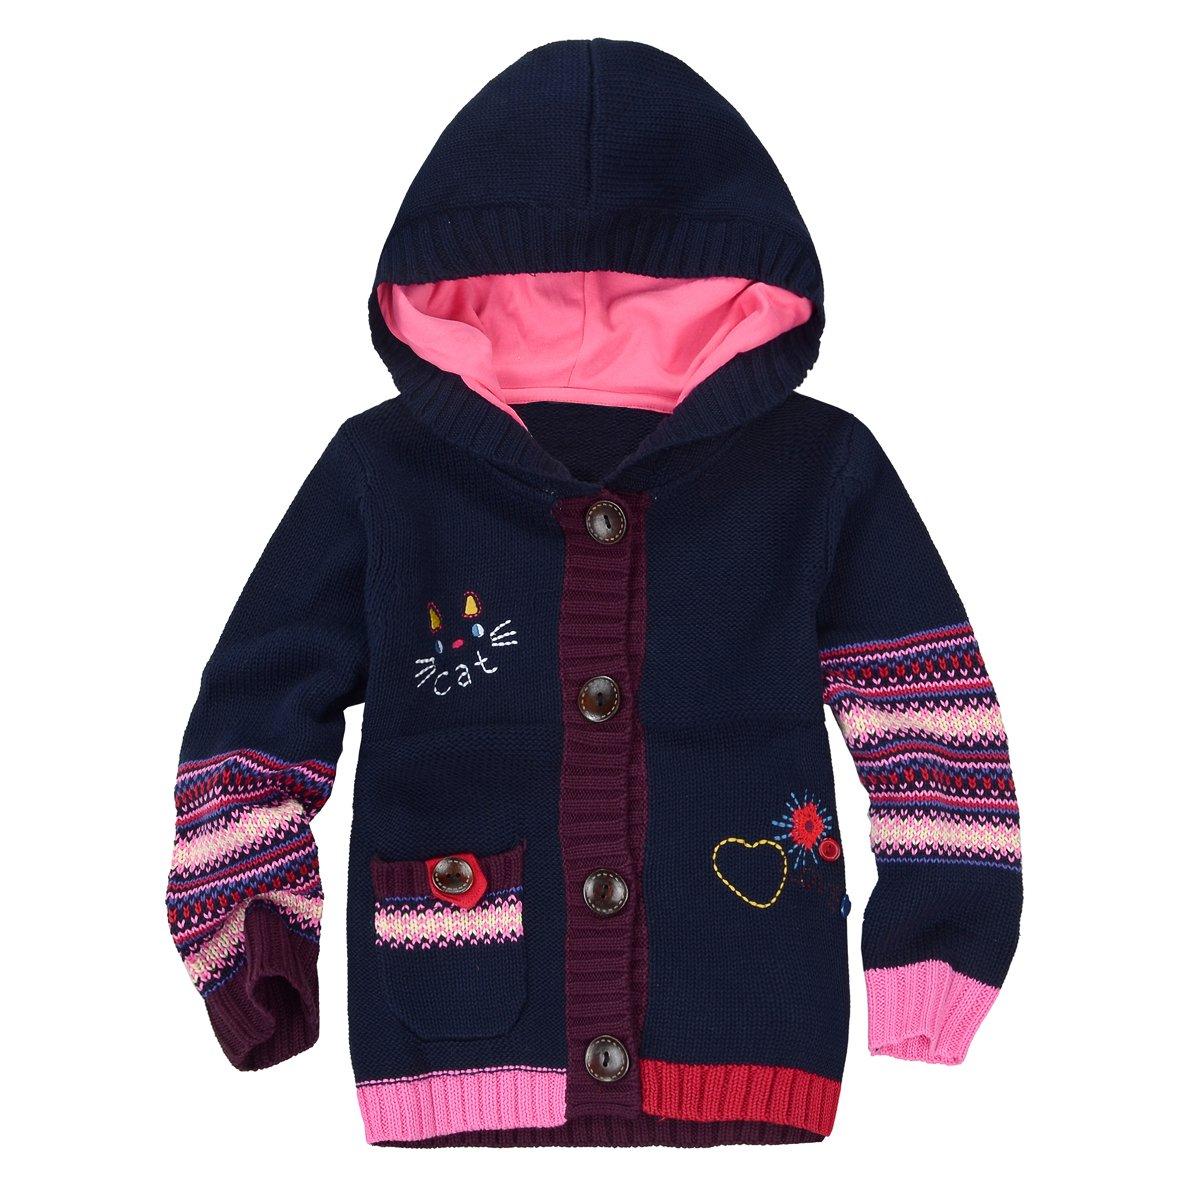 Zebra Fish Girls Button up Sweater Long Sleeve Casual Girls' Knit Cardigan 3-4T